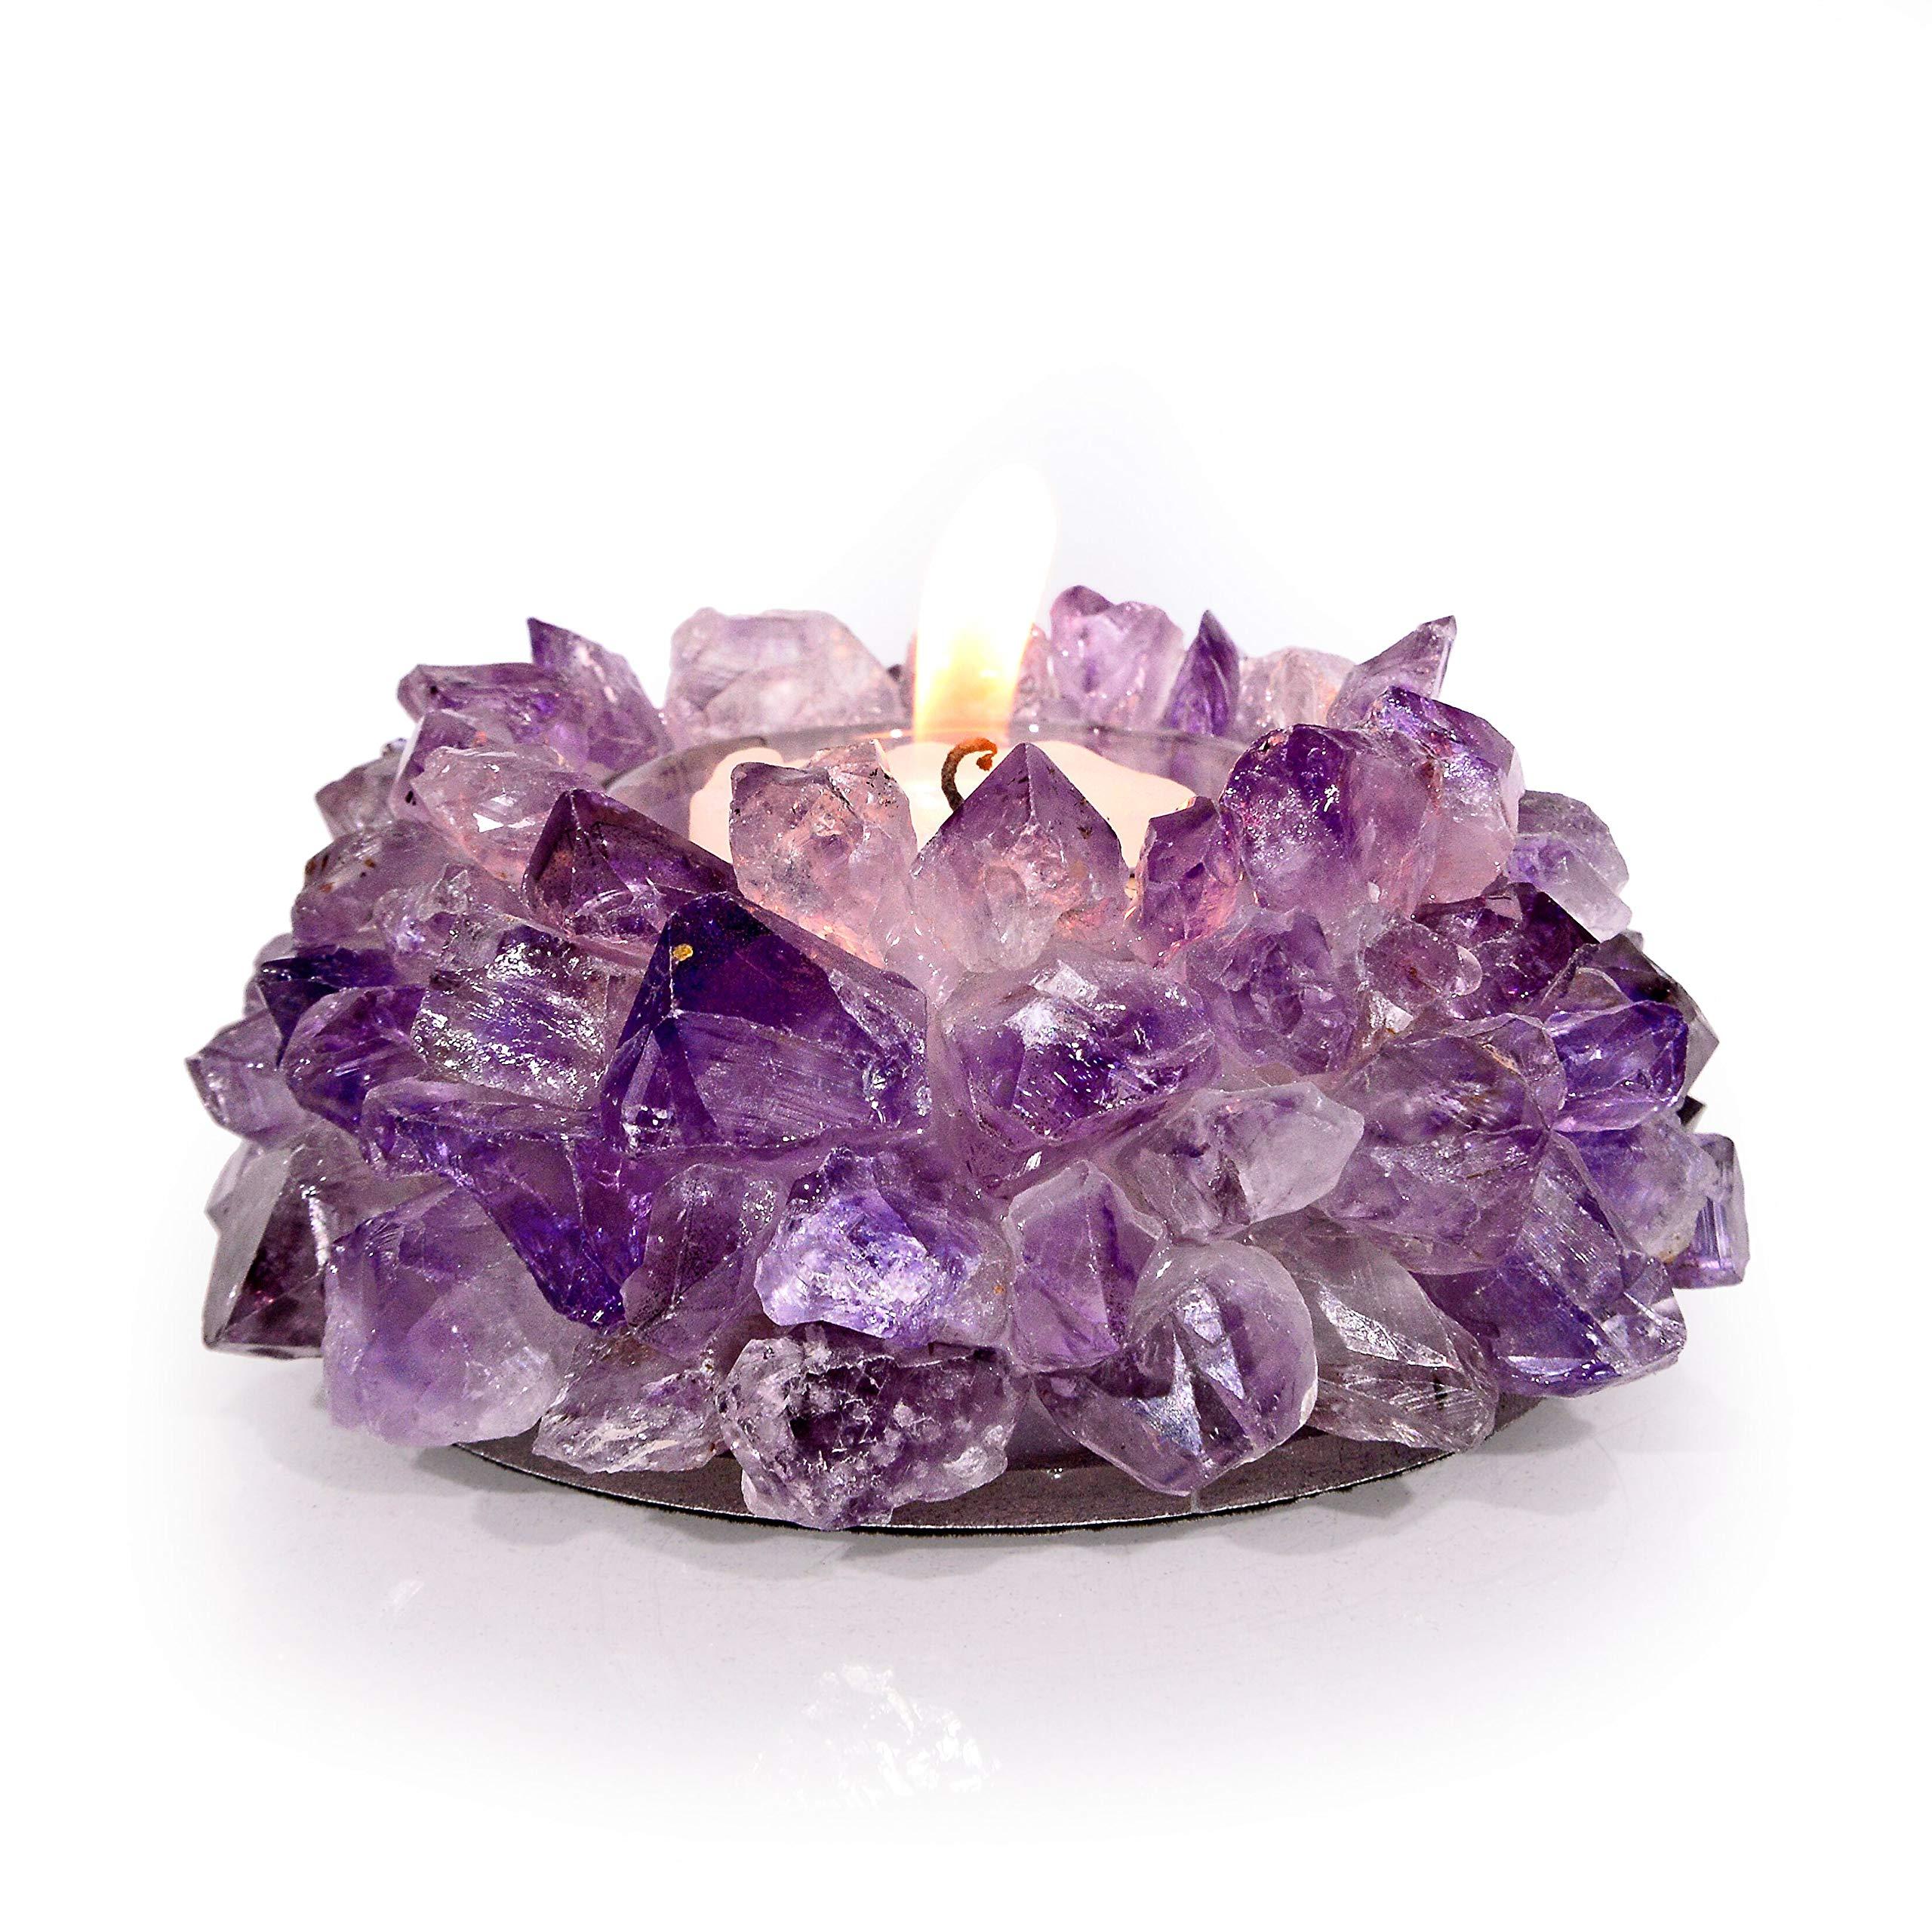 KALIFANO 5'' Natural Amethyst Candle Holder